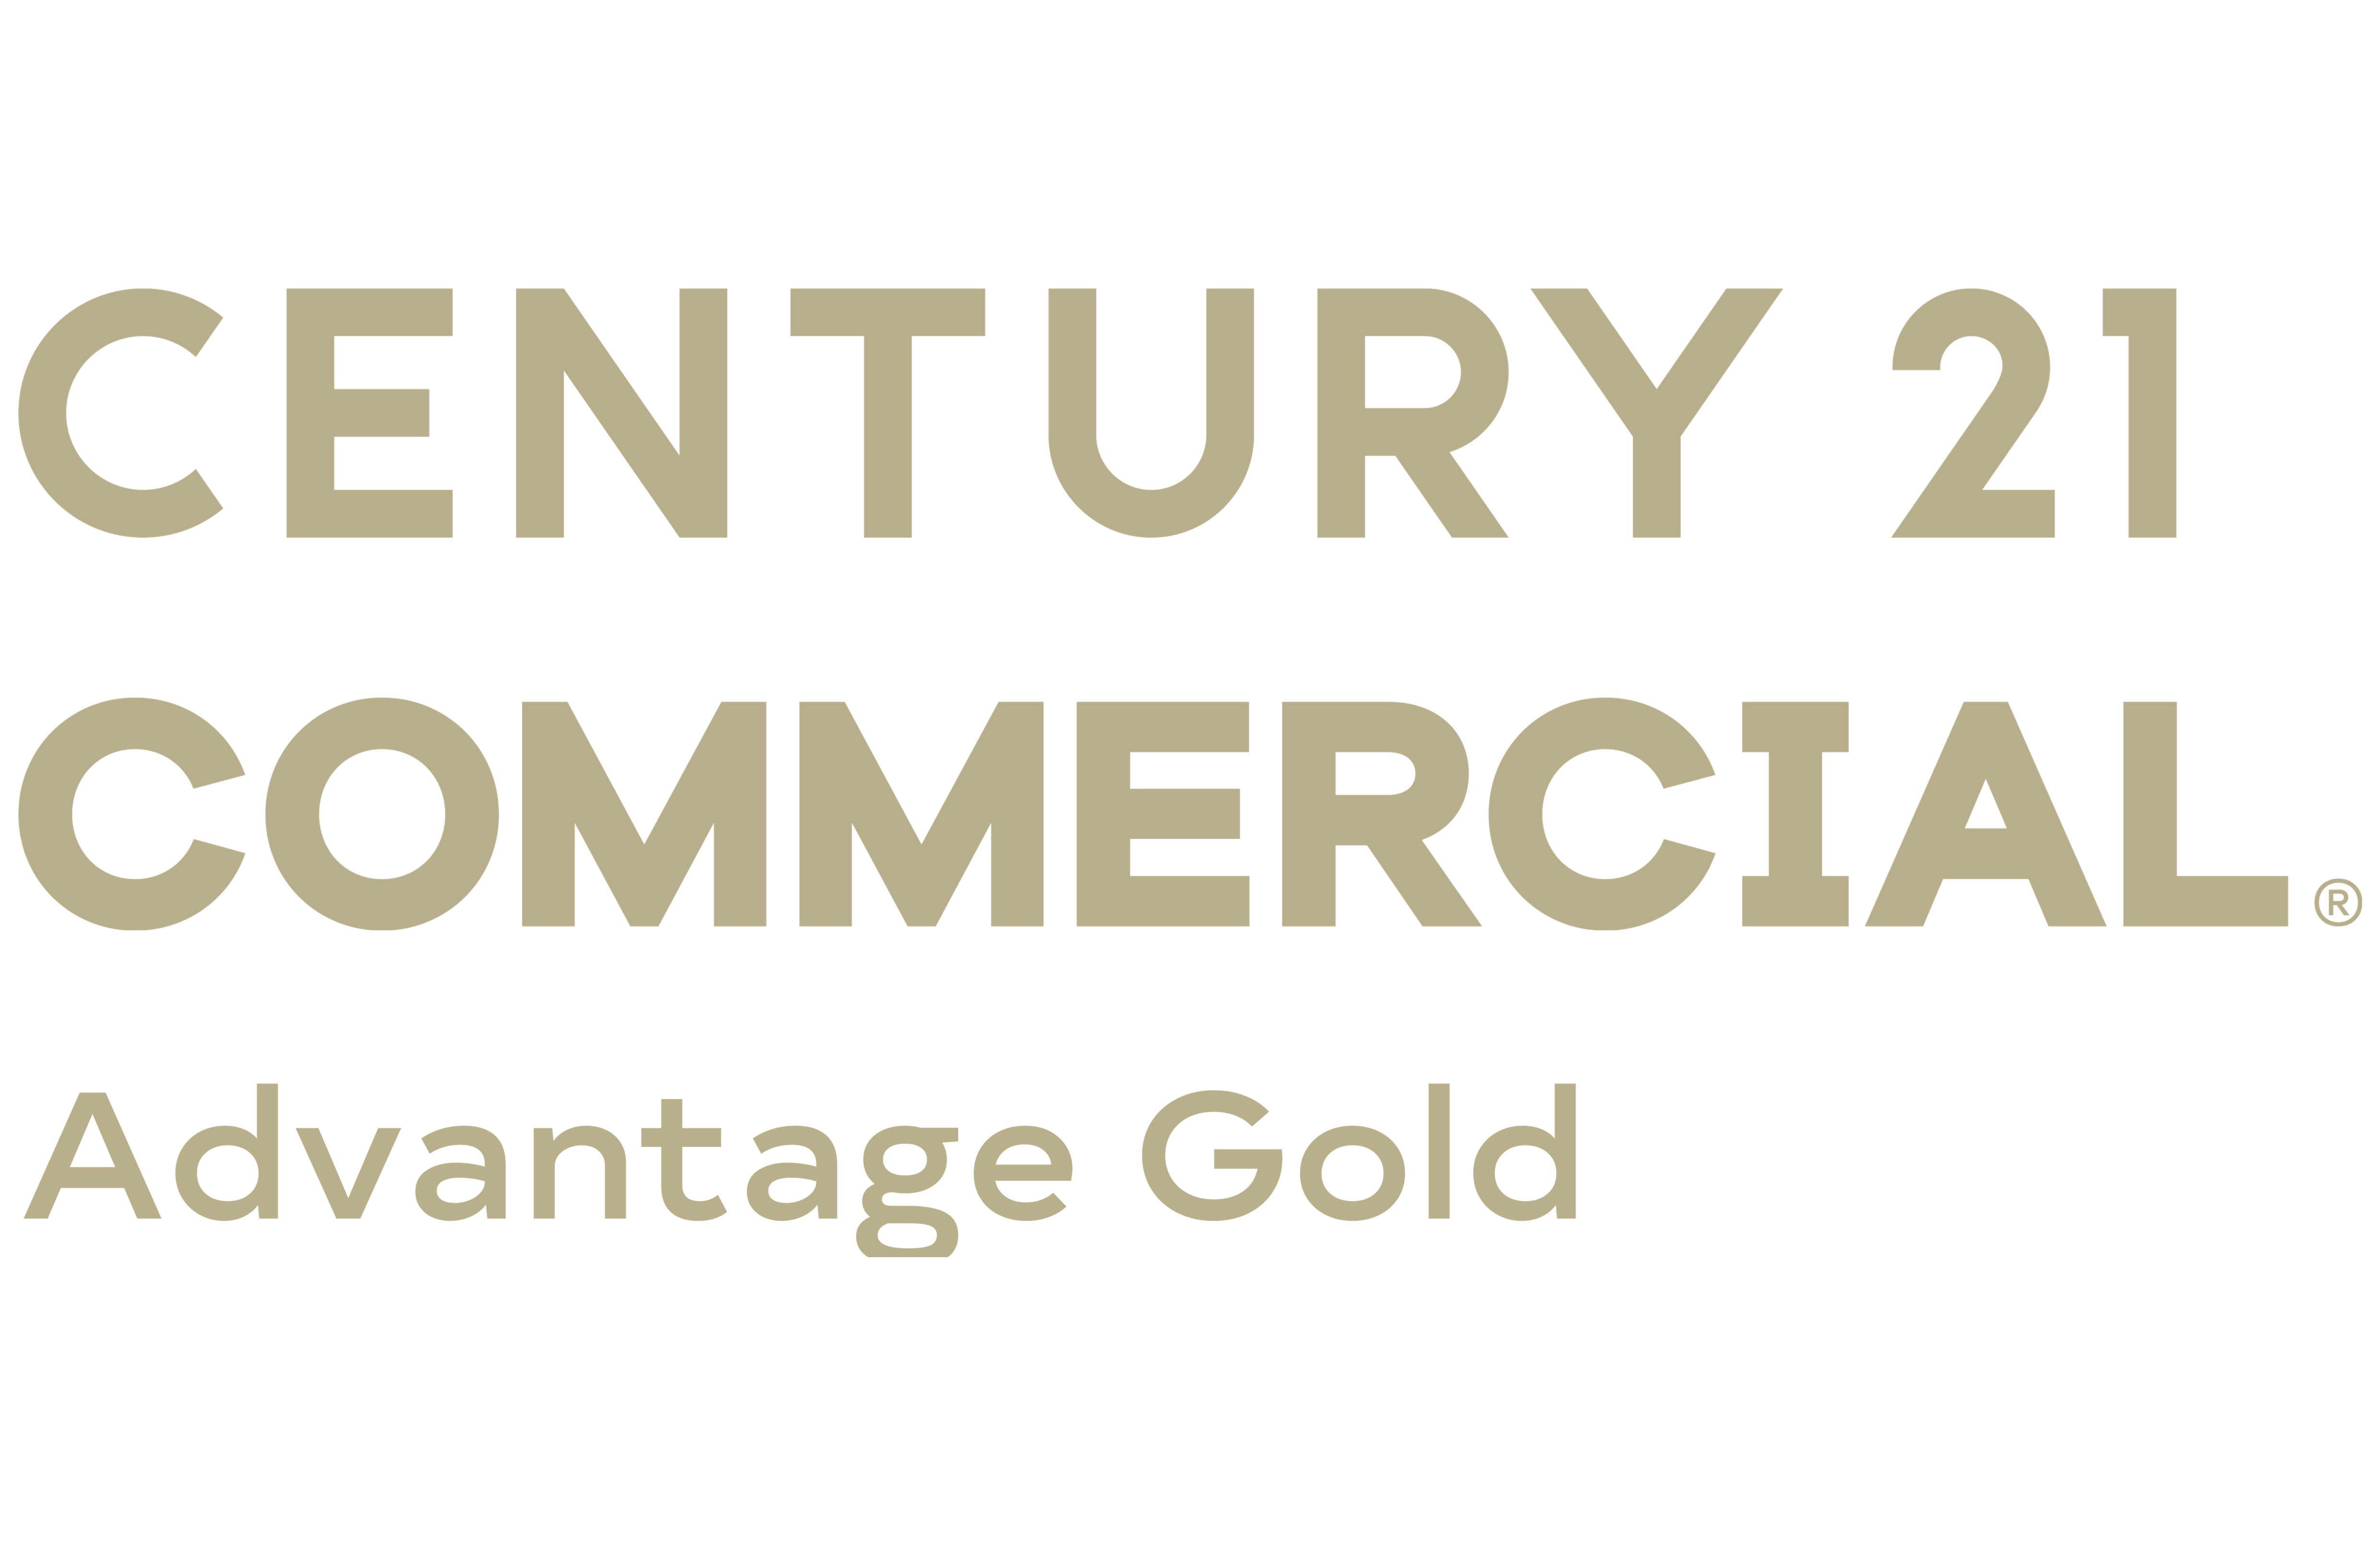 Christopher Boyle of CENTURY 21 Advantage Gold logo